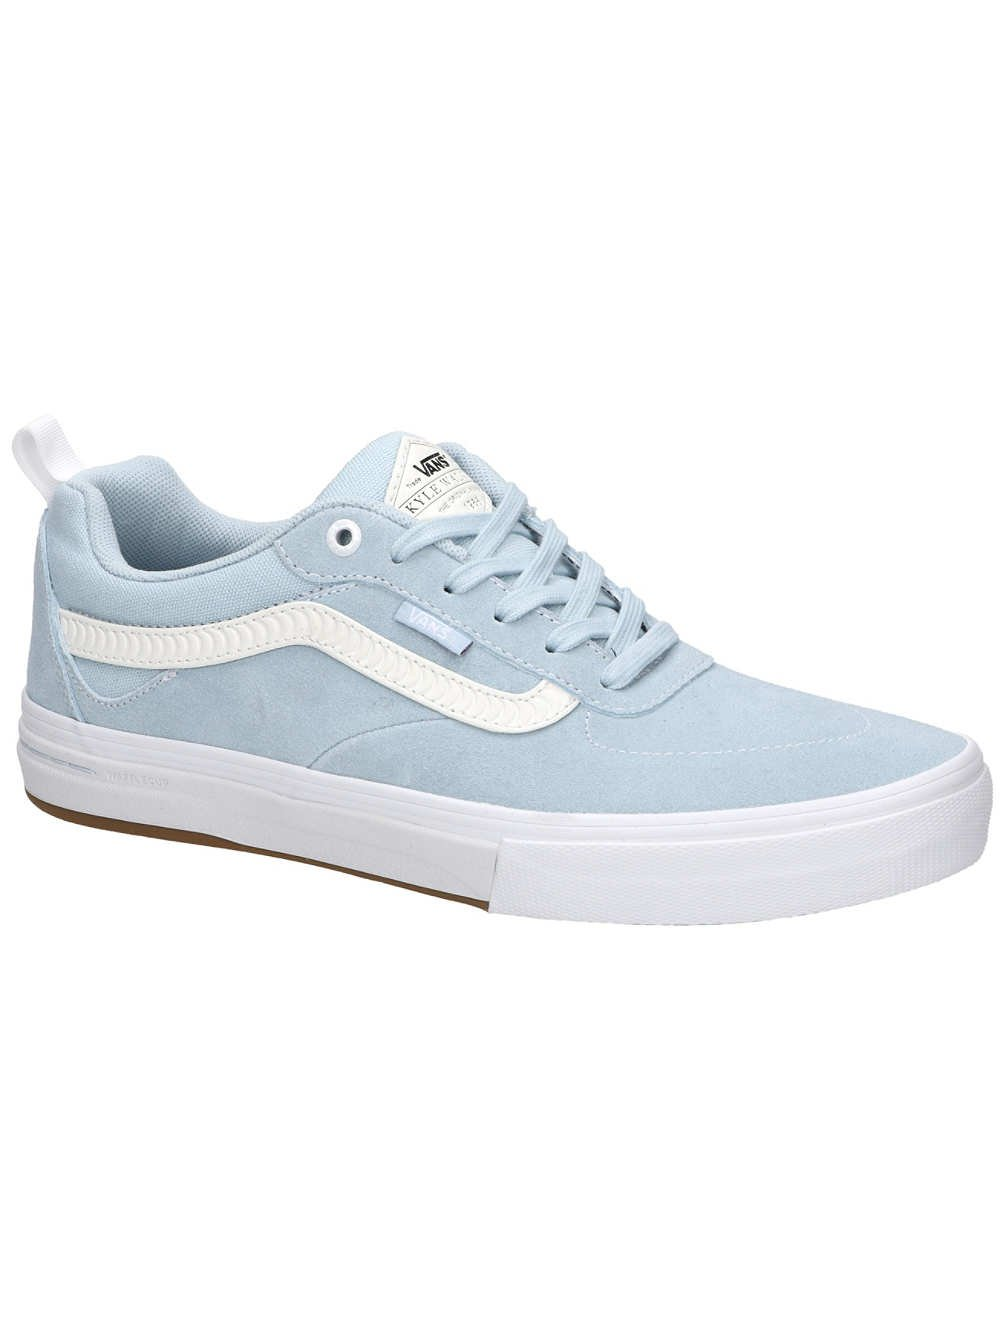 d89f0691ac Galleon - Vans X Spitfire Kyle Walker Pro Sneakers (Baby Blue) Men s Suede Skate  Shoes